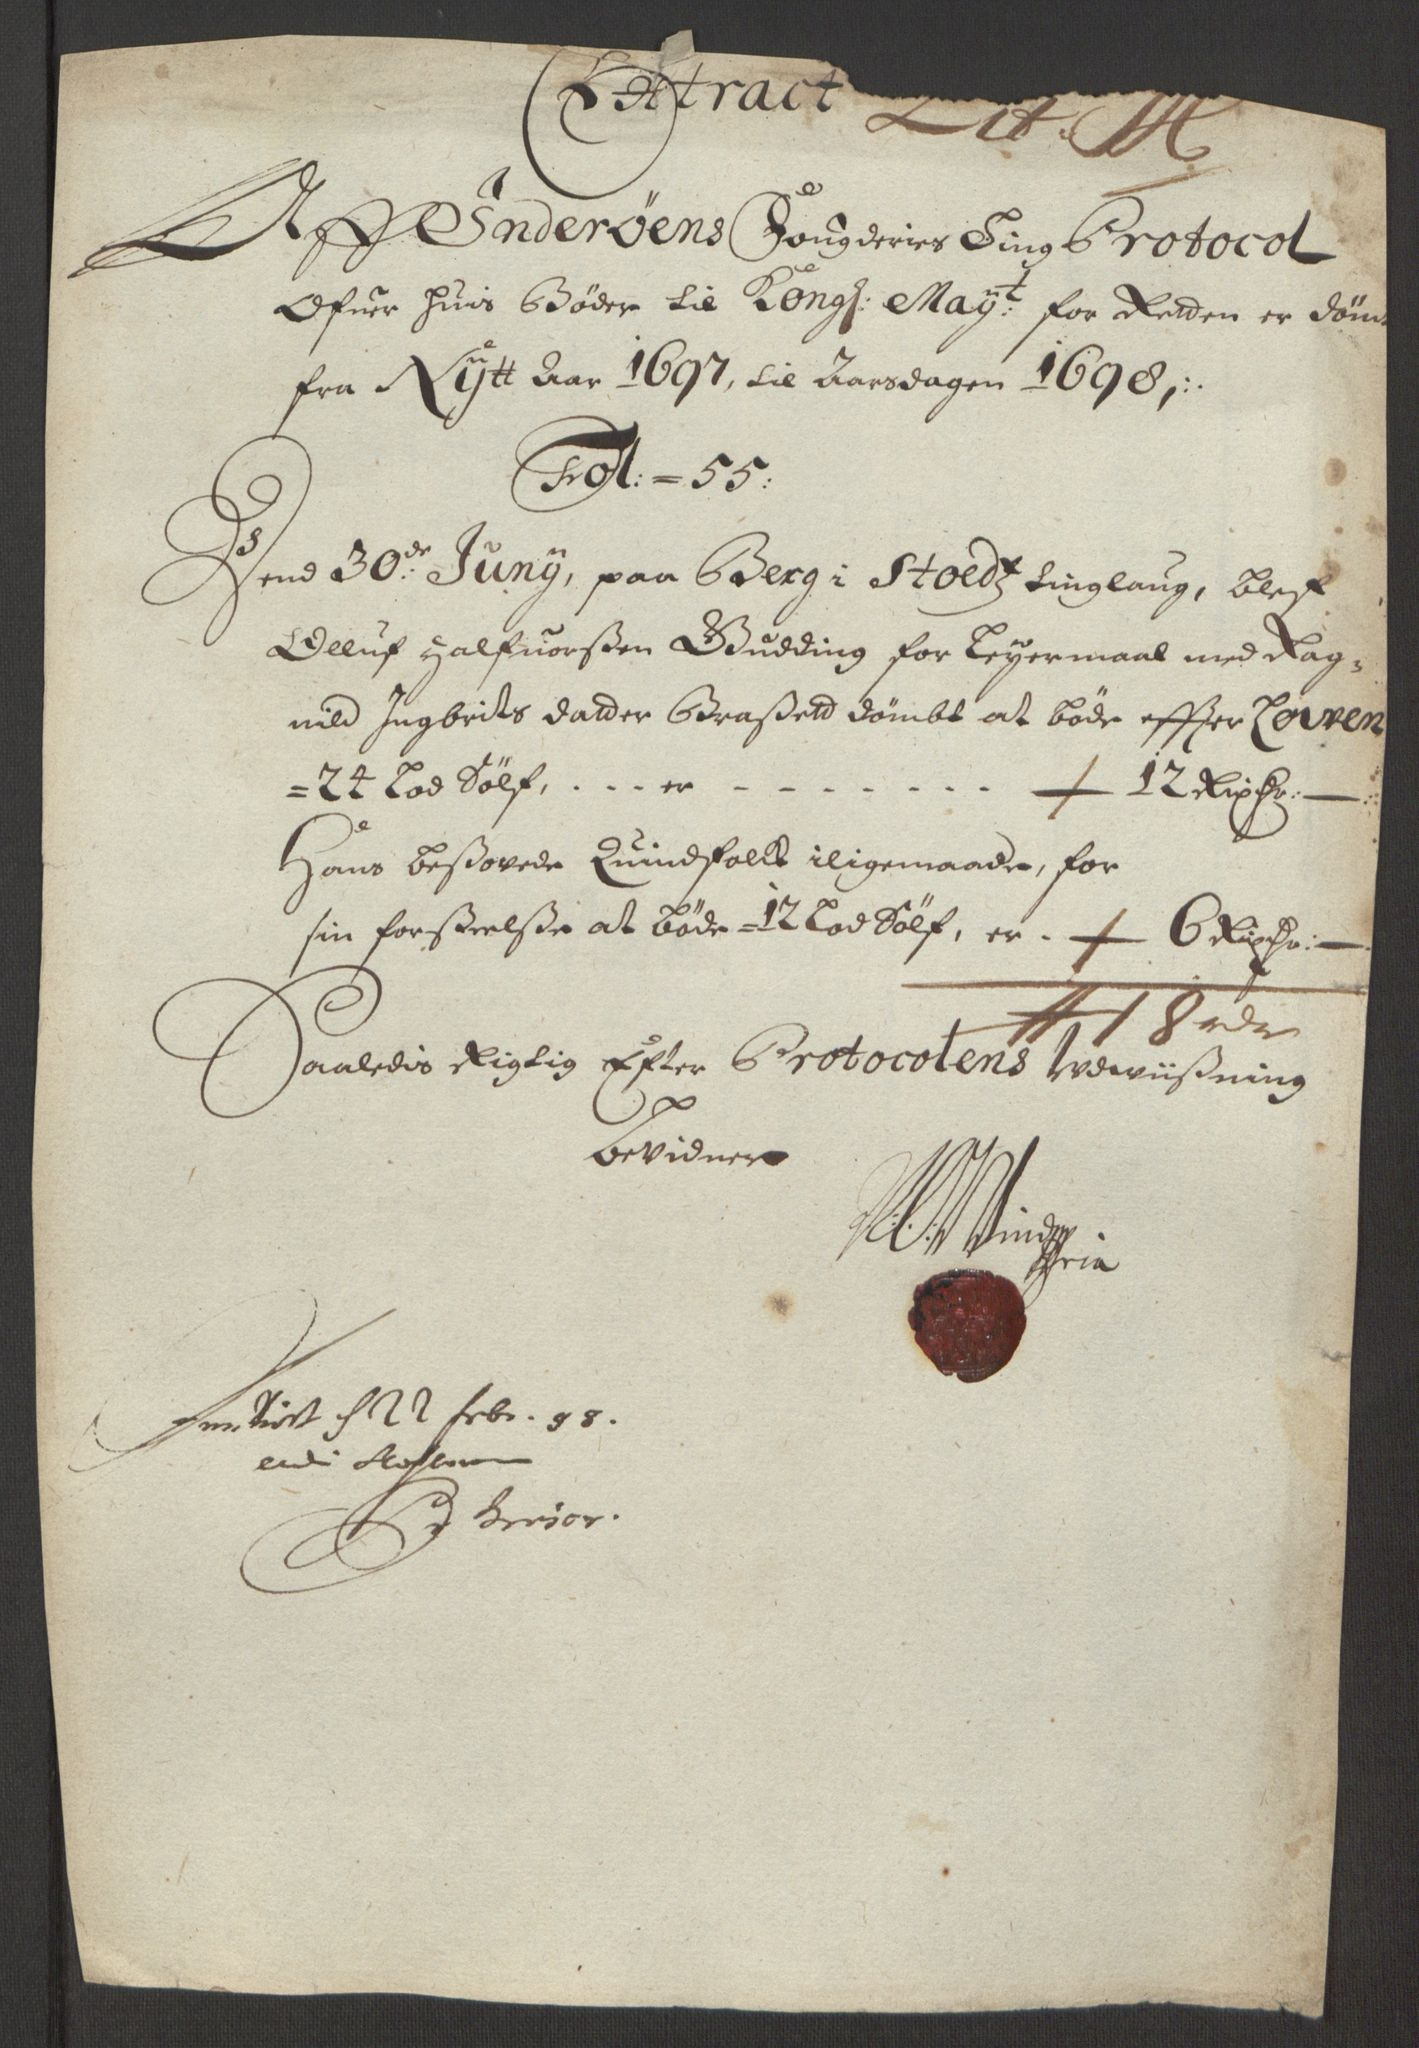 RA, Rentekammeret inntil 1814, Reviderte regnskaper, Fogderegnskap, R63/L4309: Fogderegnskap Inderøy, 1695-1697, s. 498